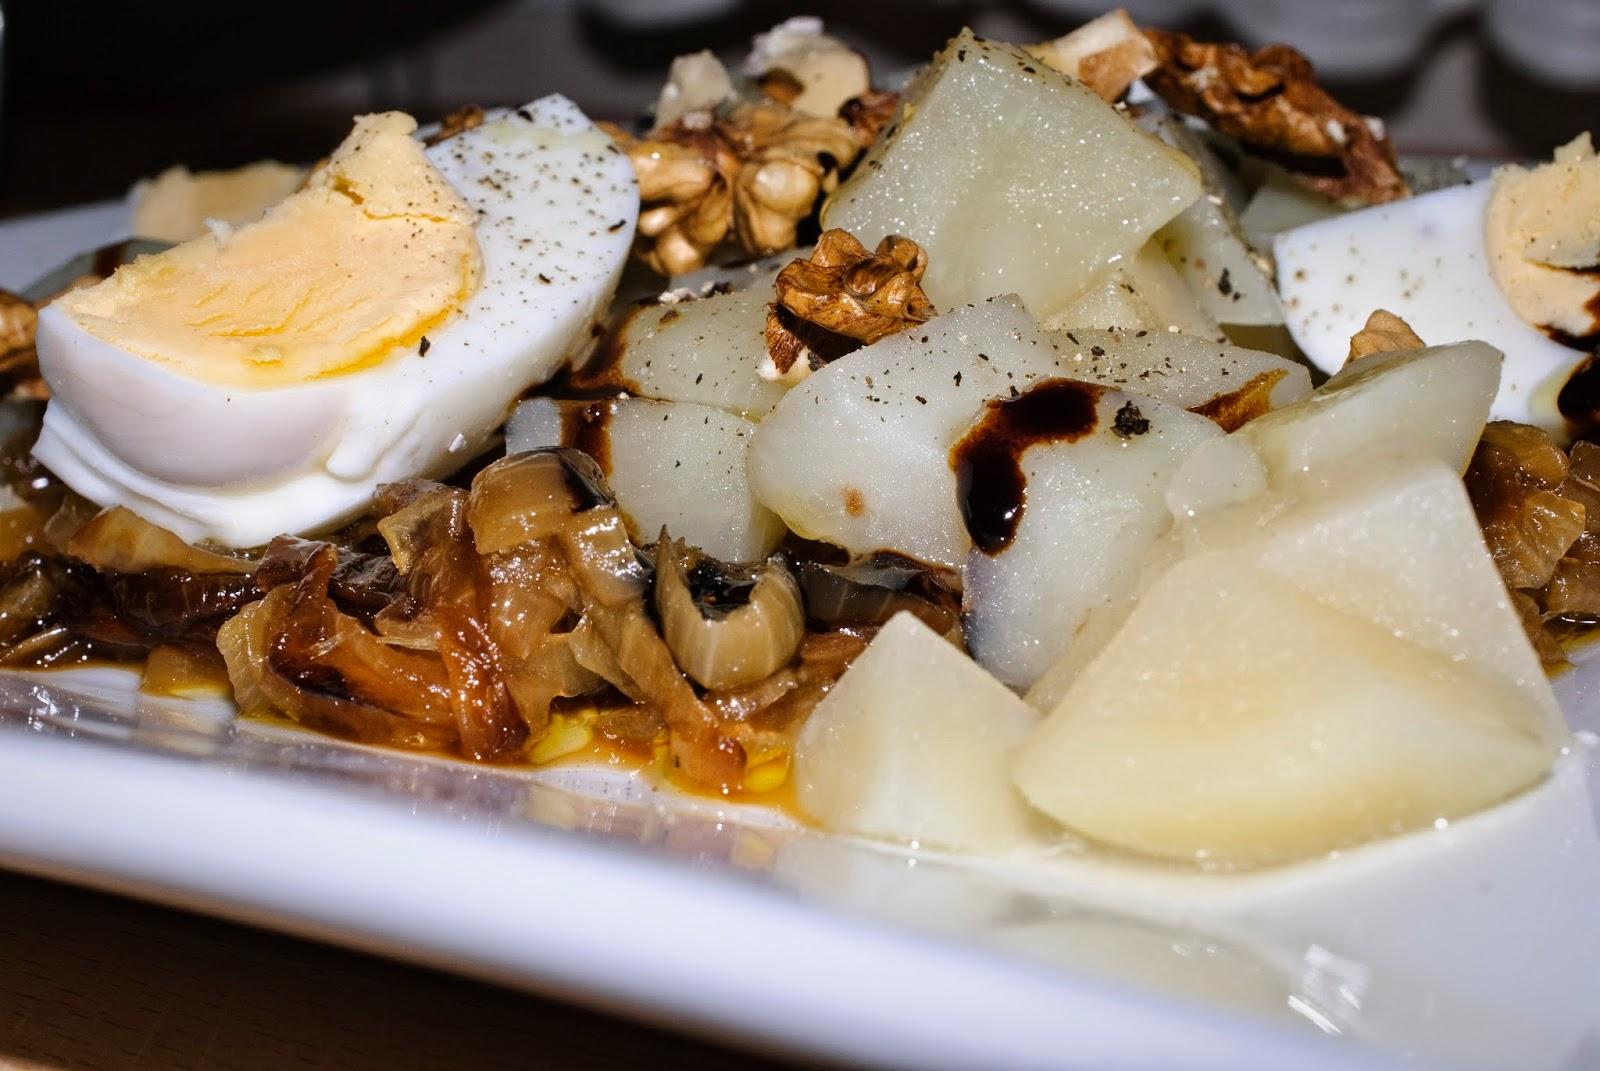 ensalada de patata; potato salad